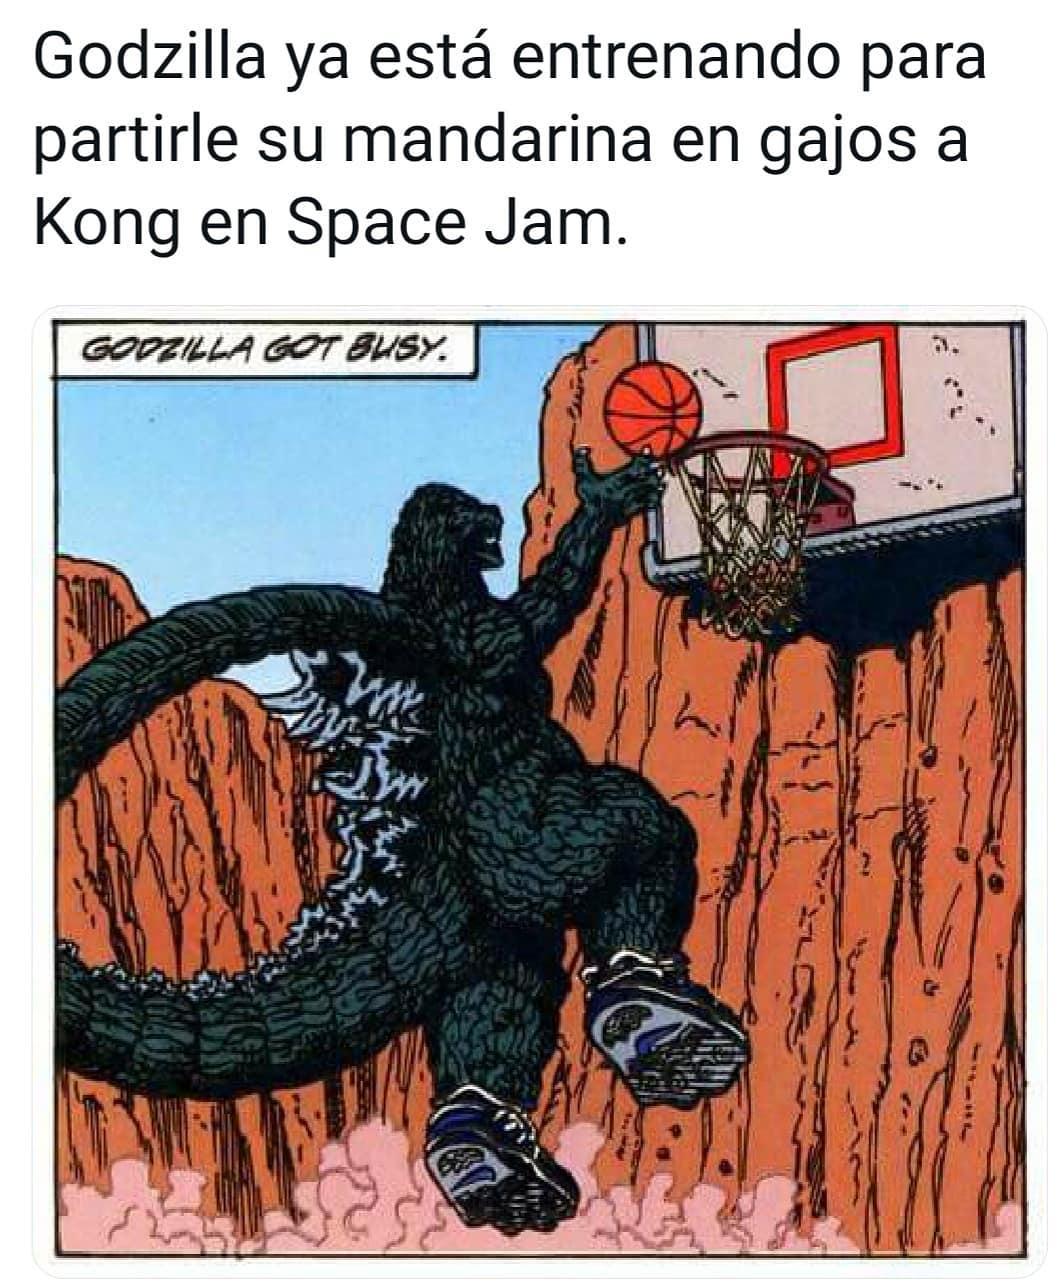 Godzilla ya está entrenando para partirle su mandarina en gajos a Kong en Space Jam. Goozilla got busy.